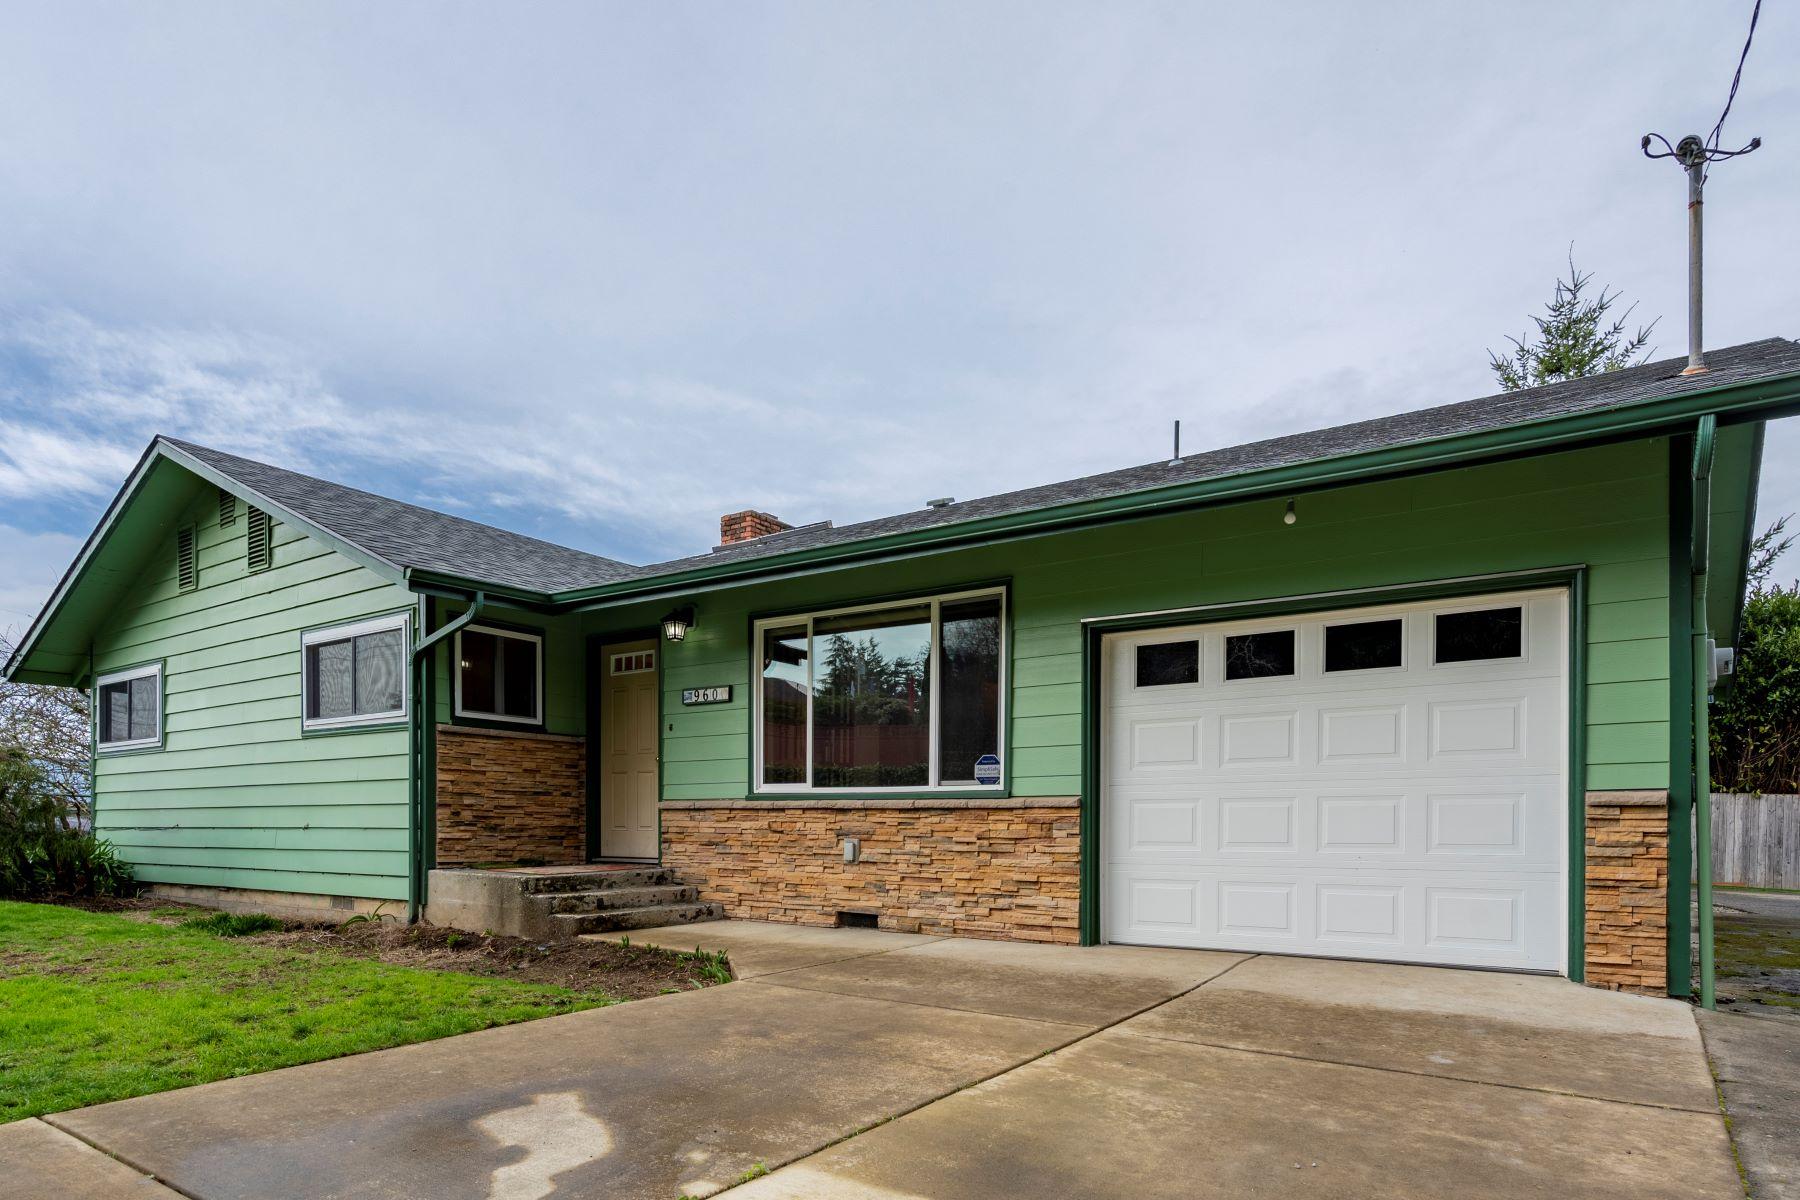 Single Family Homes για την Πώληση στο 960 Lockhart Street, North Bend, OR 97459 North Bend, Ορεγκον 97459 Ηνωμένες Πολιτείες